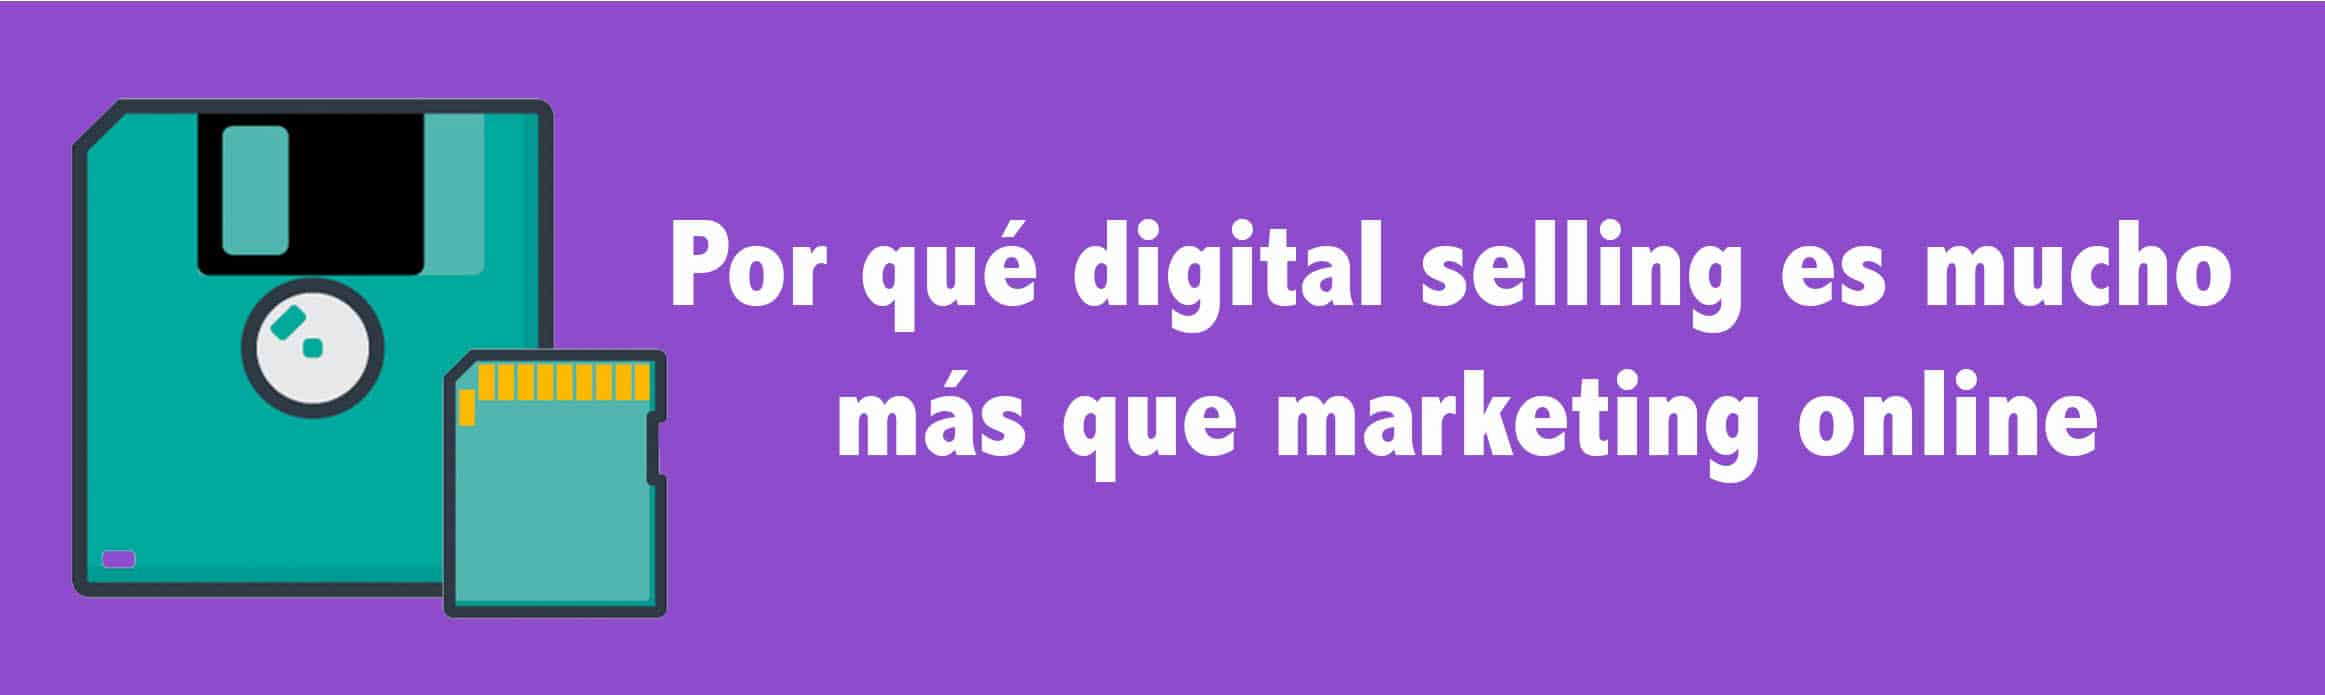 digital selling, marketing